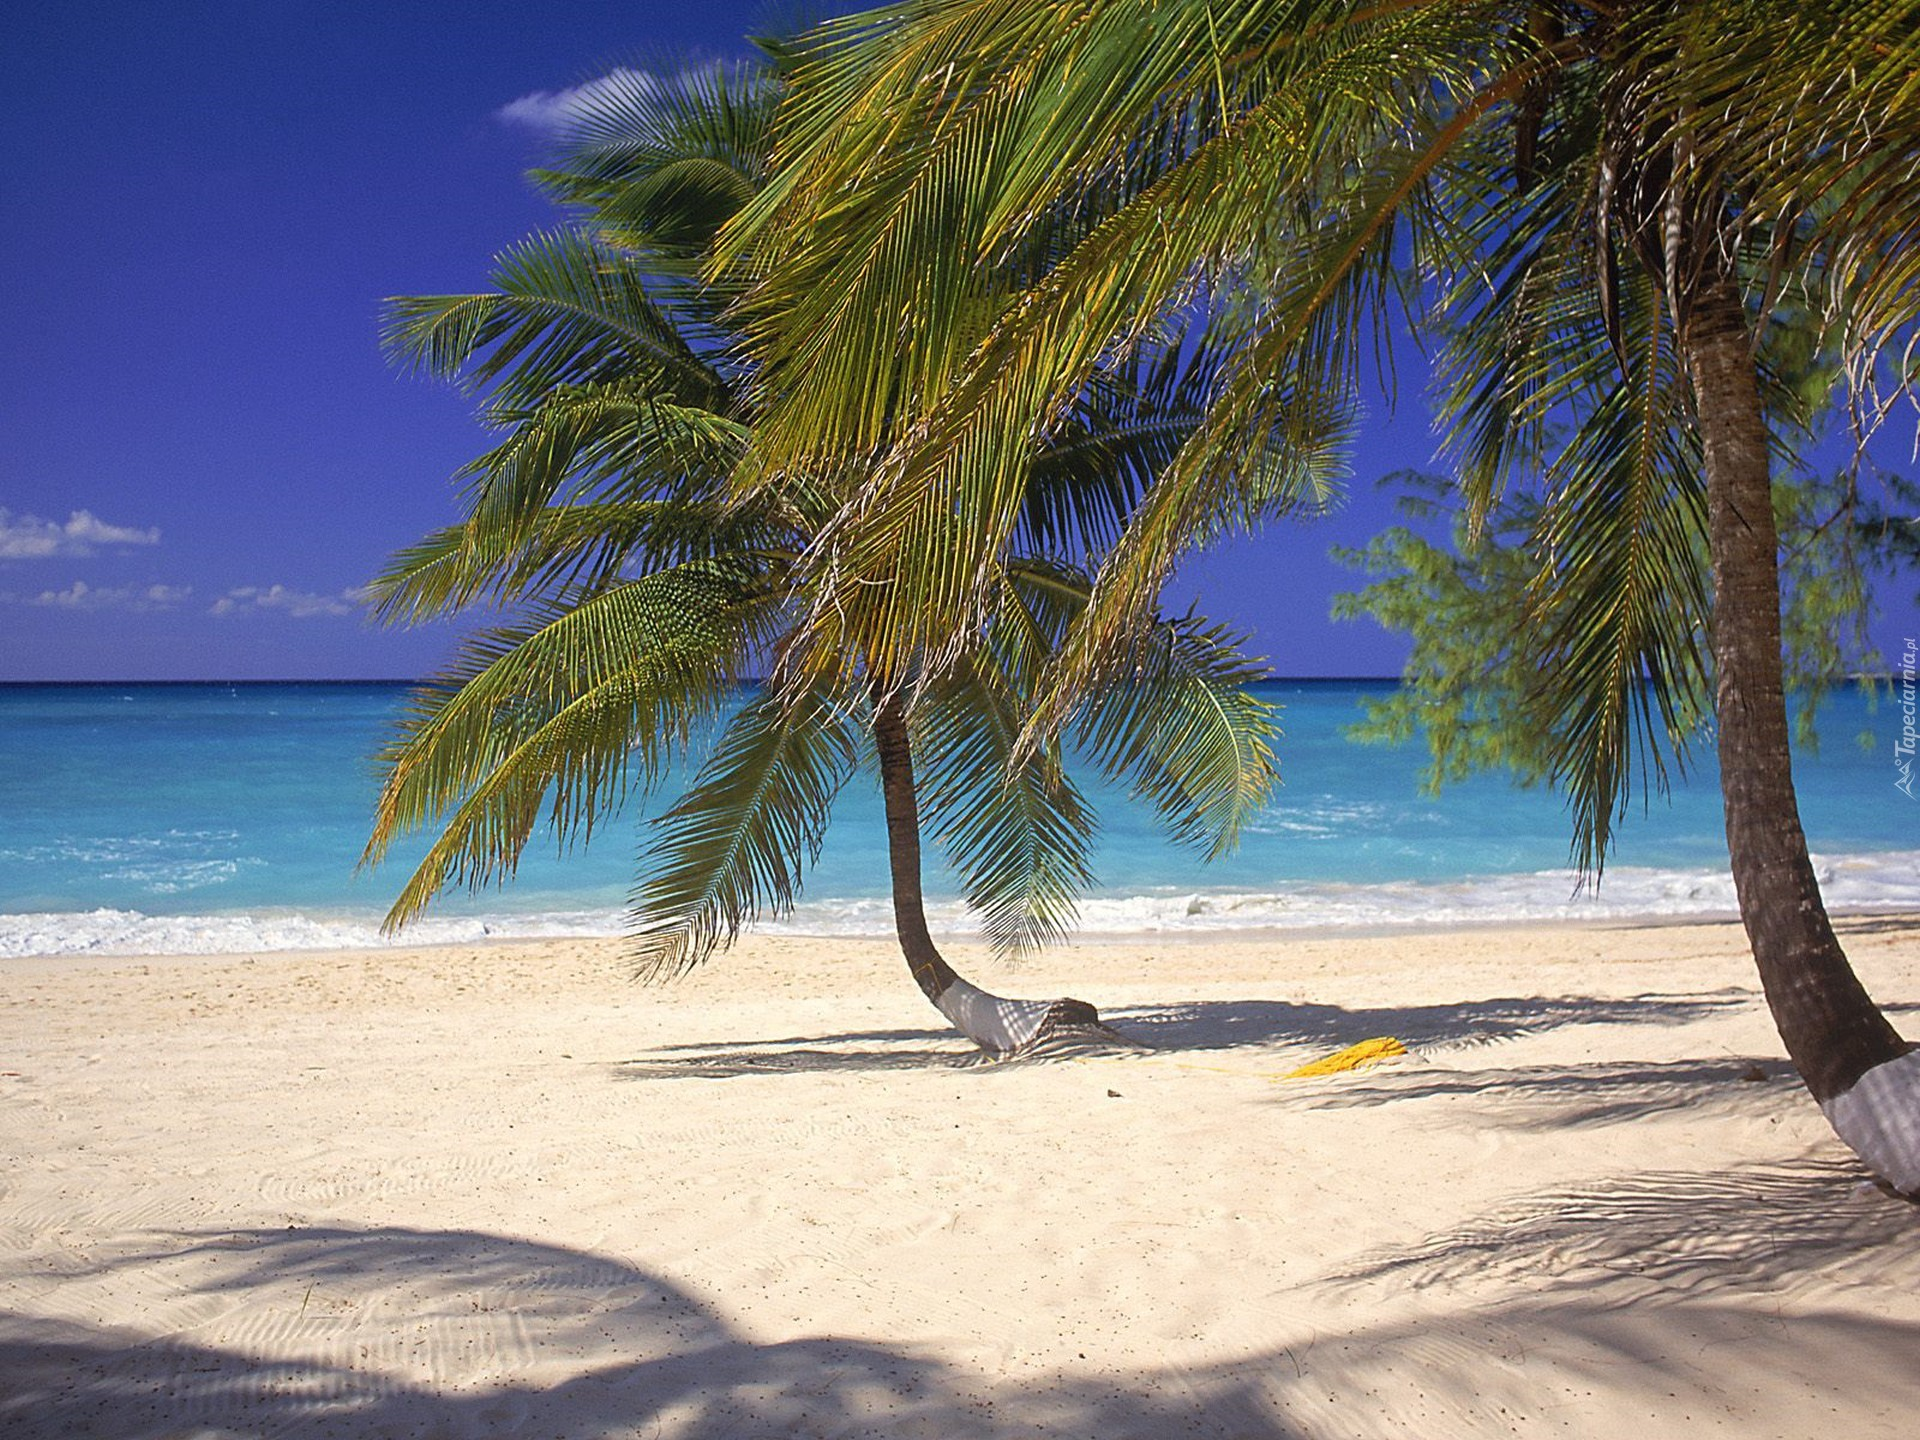 Пляж Махо (Maho Beach) находится на острове Святого...